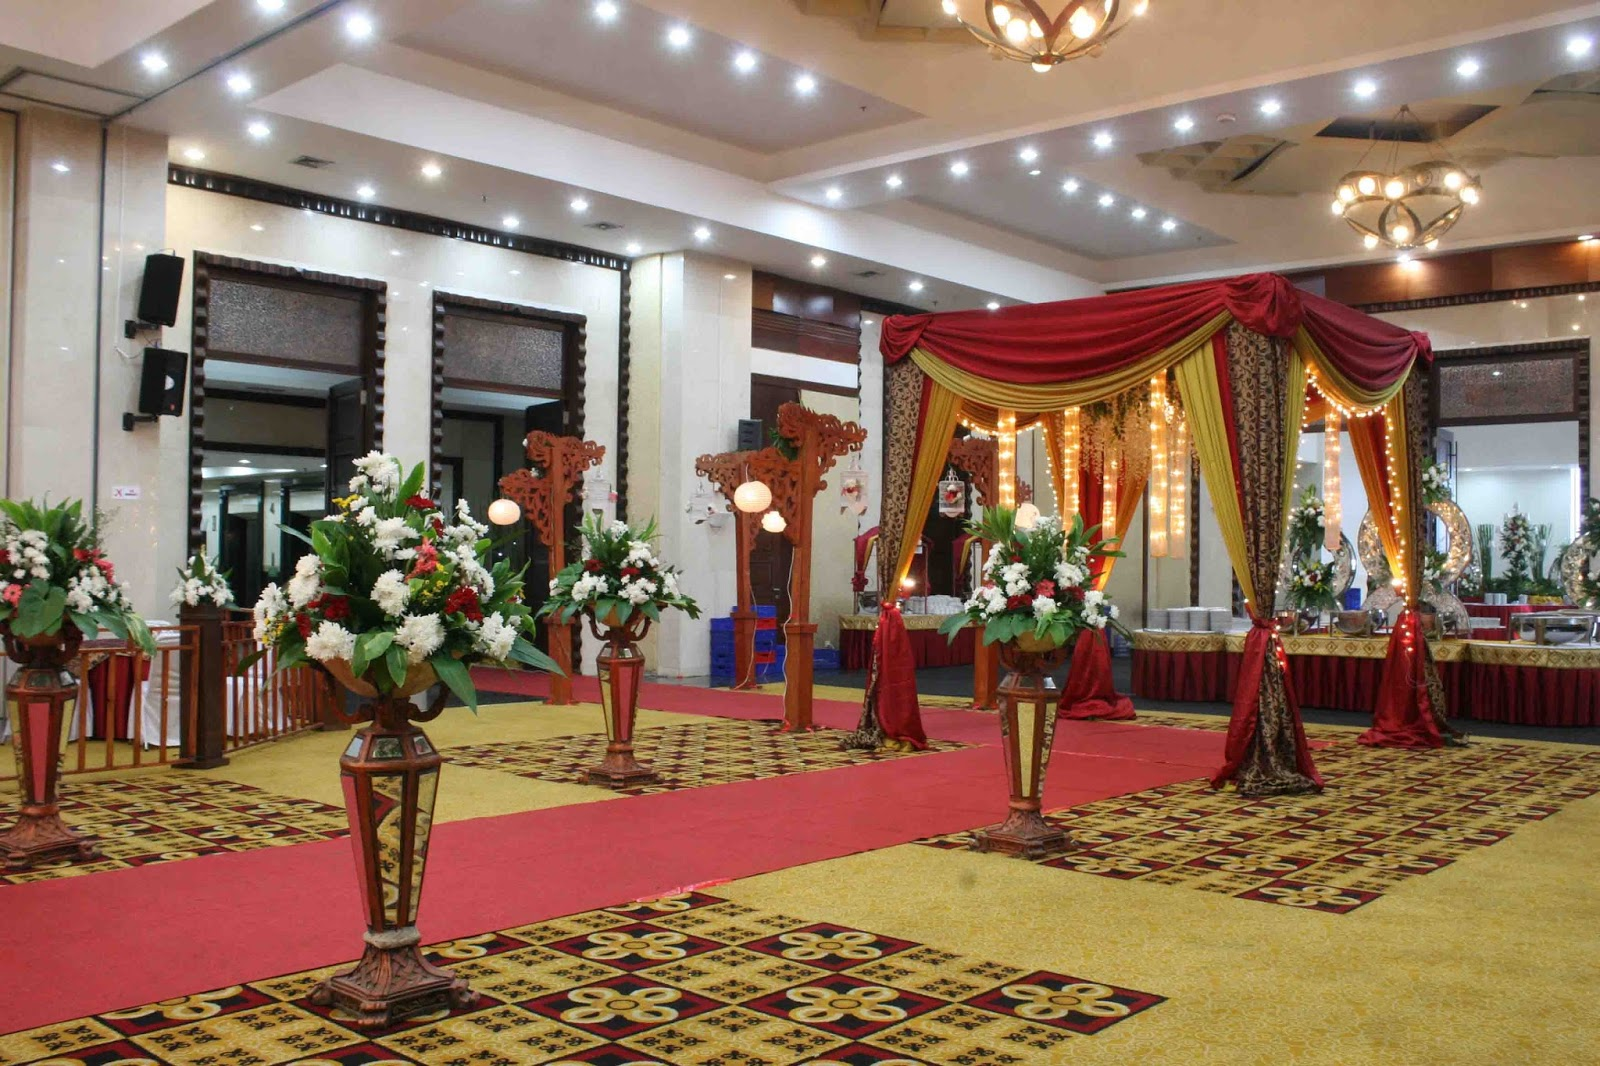 DEKORASI PERNIKAHAN DI GEDUNG | PRIMERA WEDDING | WEDDING ...